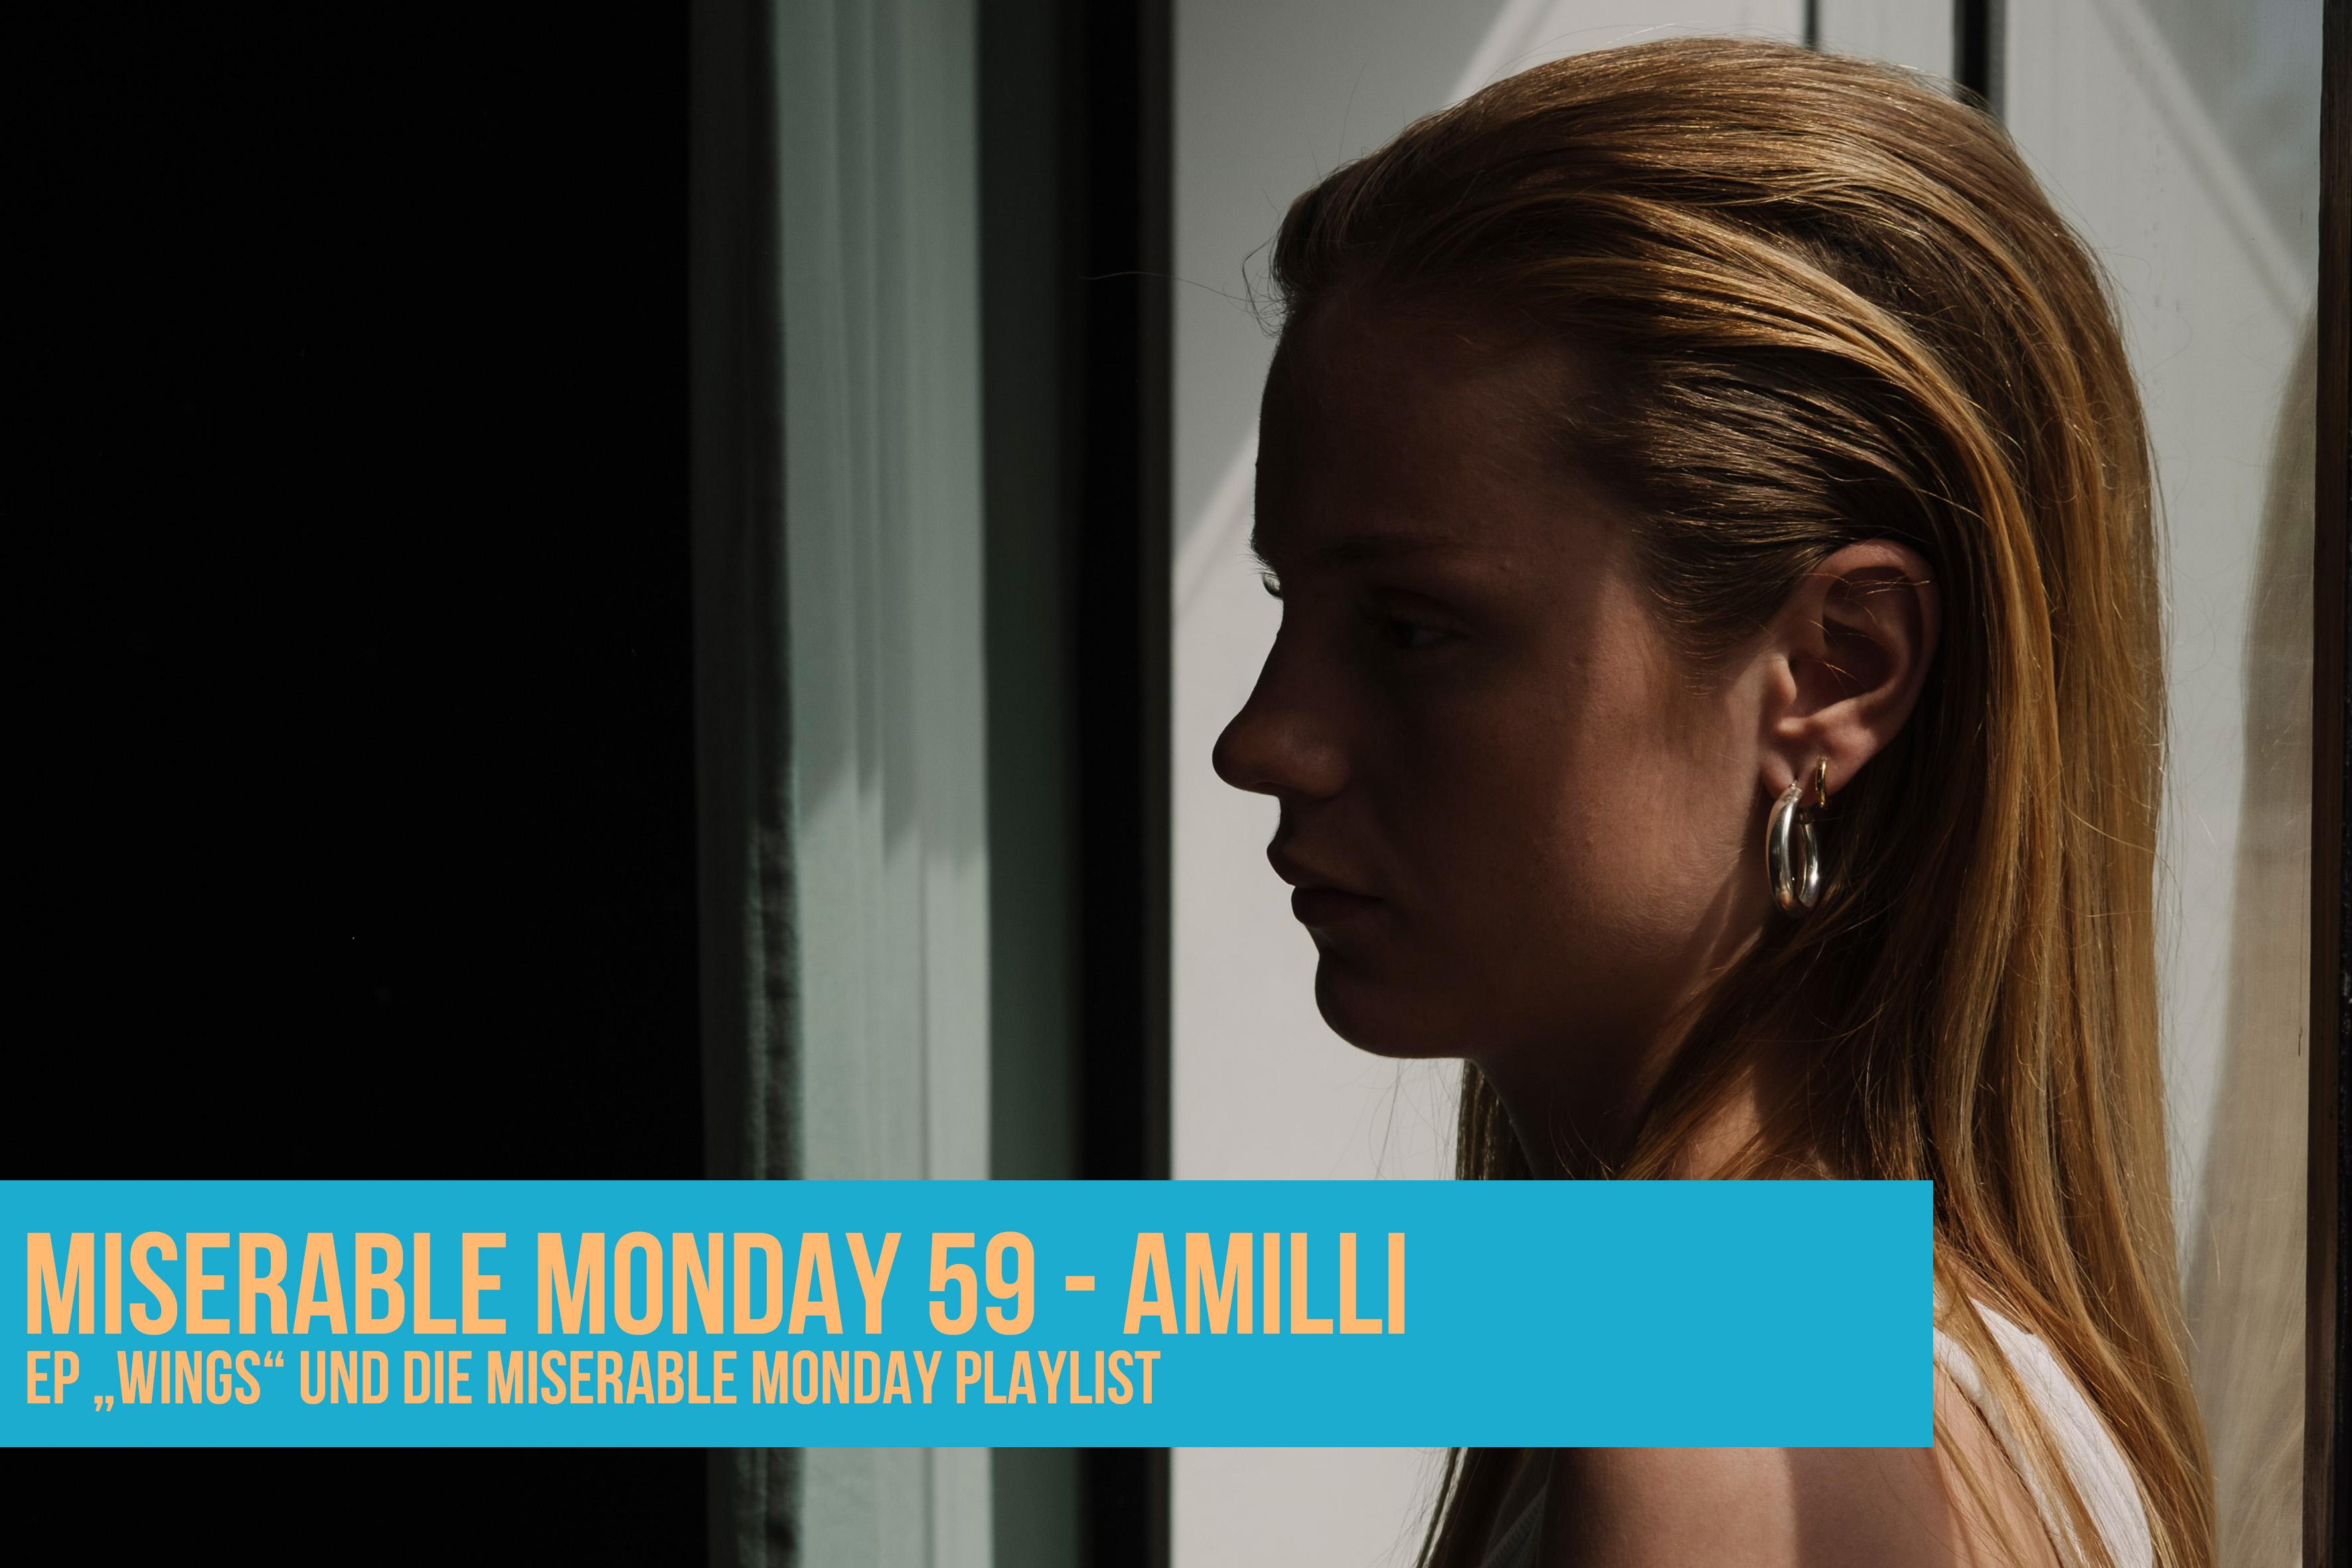 59 - Amilli